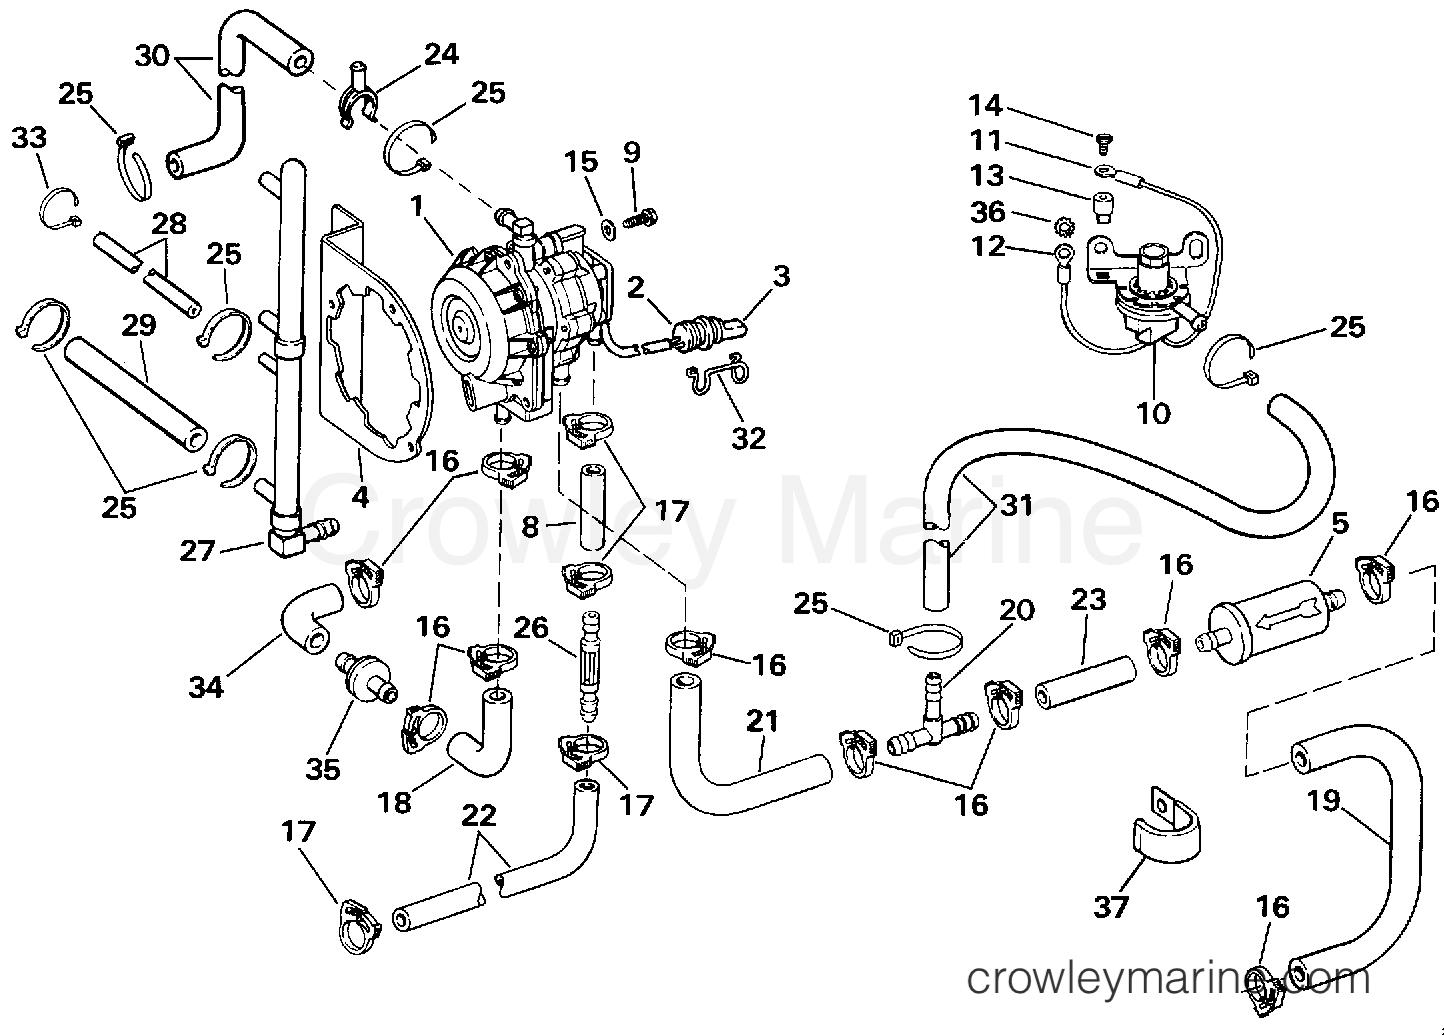 tags: #1973 mercury outboard motor wiring diagram#1970 johnson outboard  motor wiring diagram#1981 50 hp johnson outboard wiring diagram#25 hp  johnson